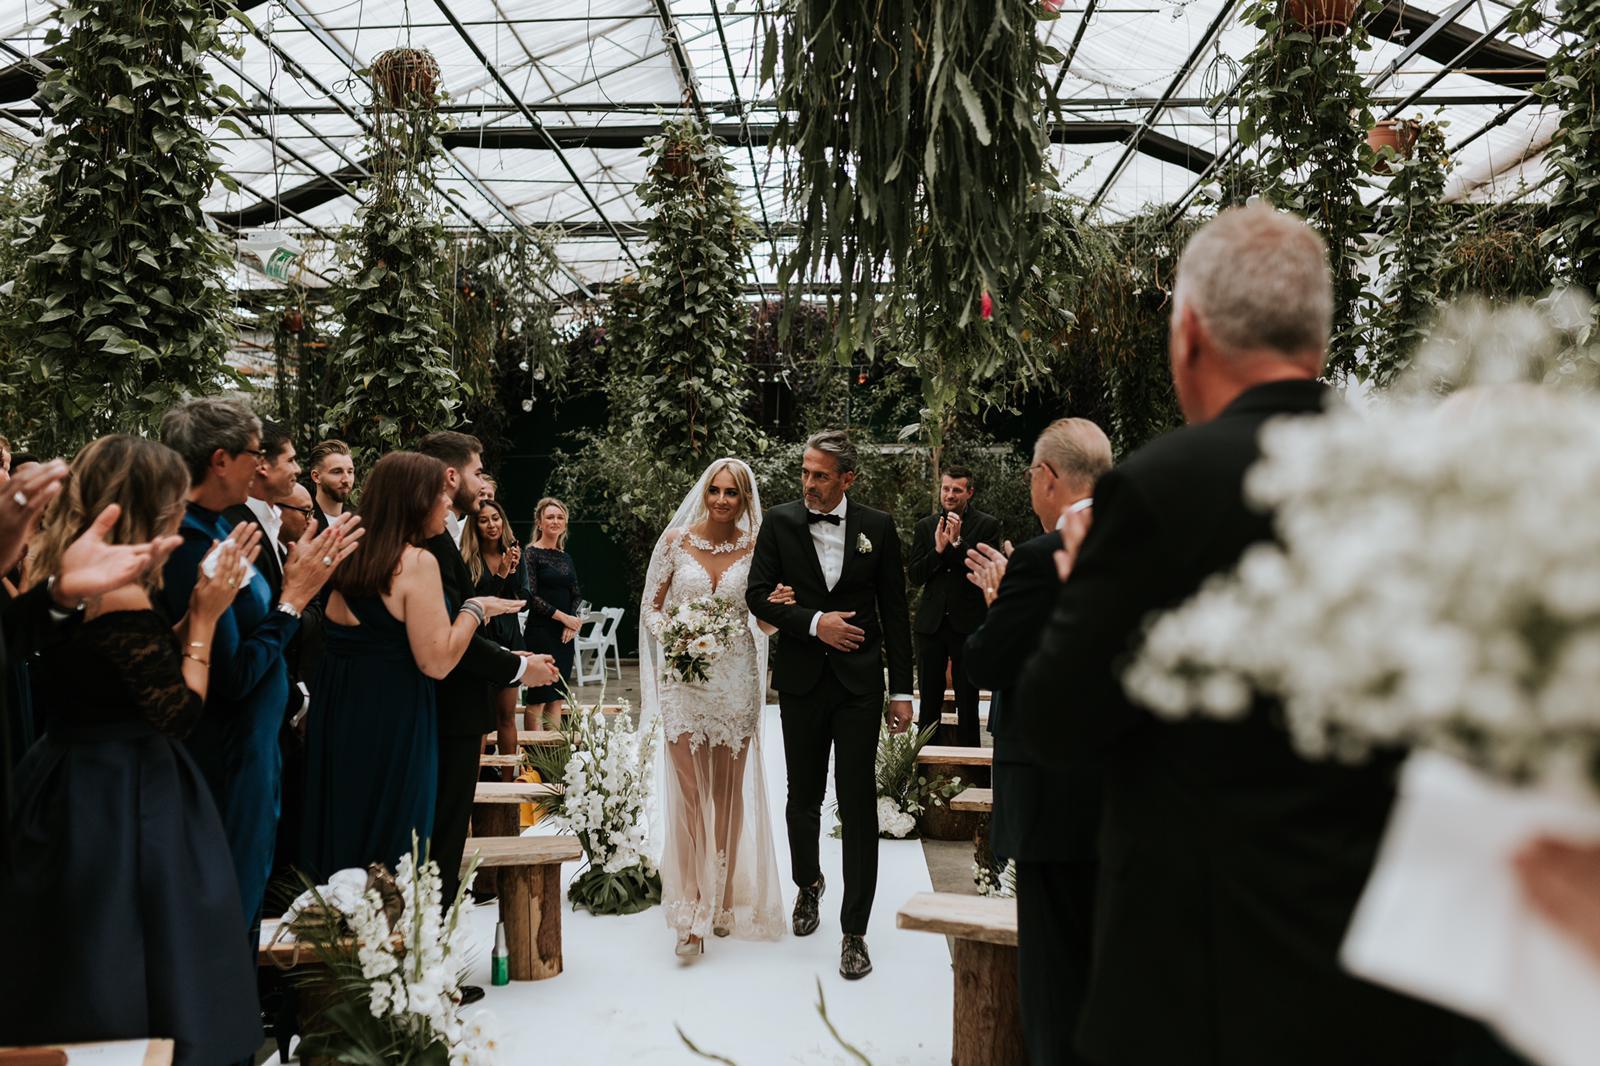 Wedding-Greenhouse-Amsterdam59.jpeg